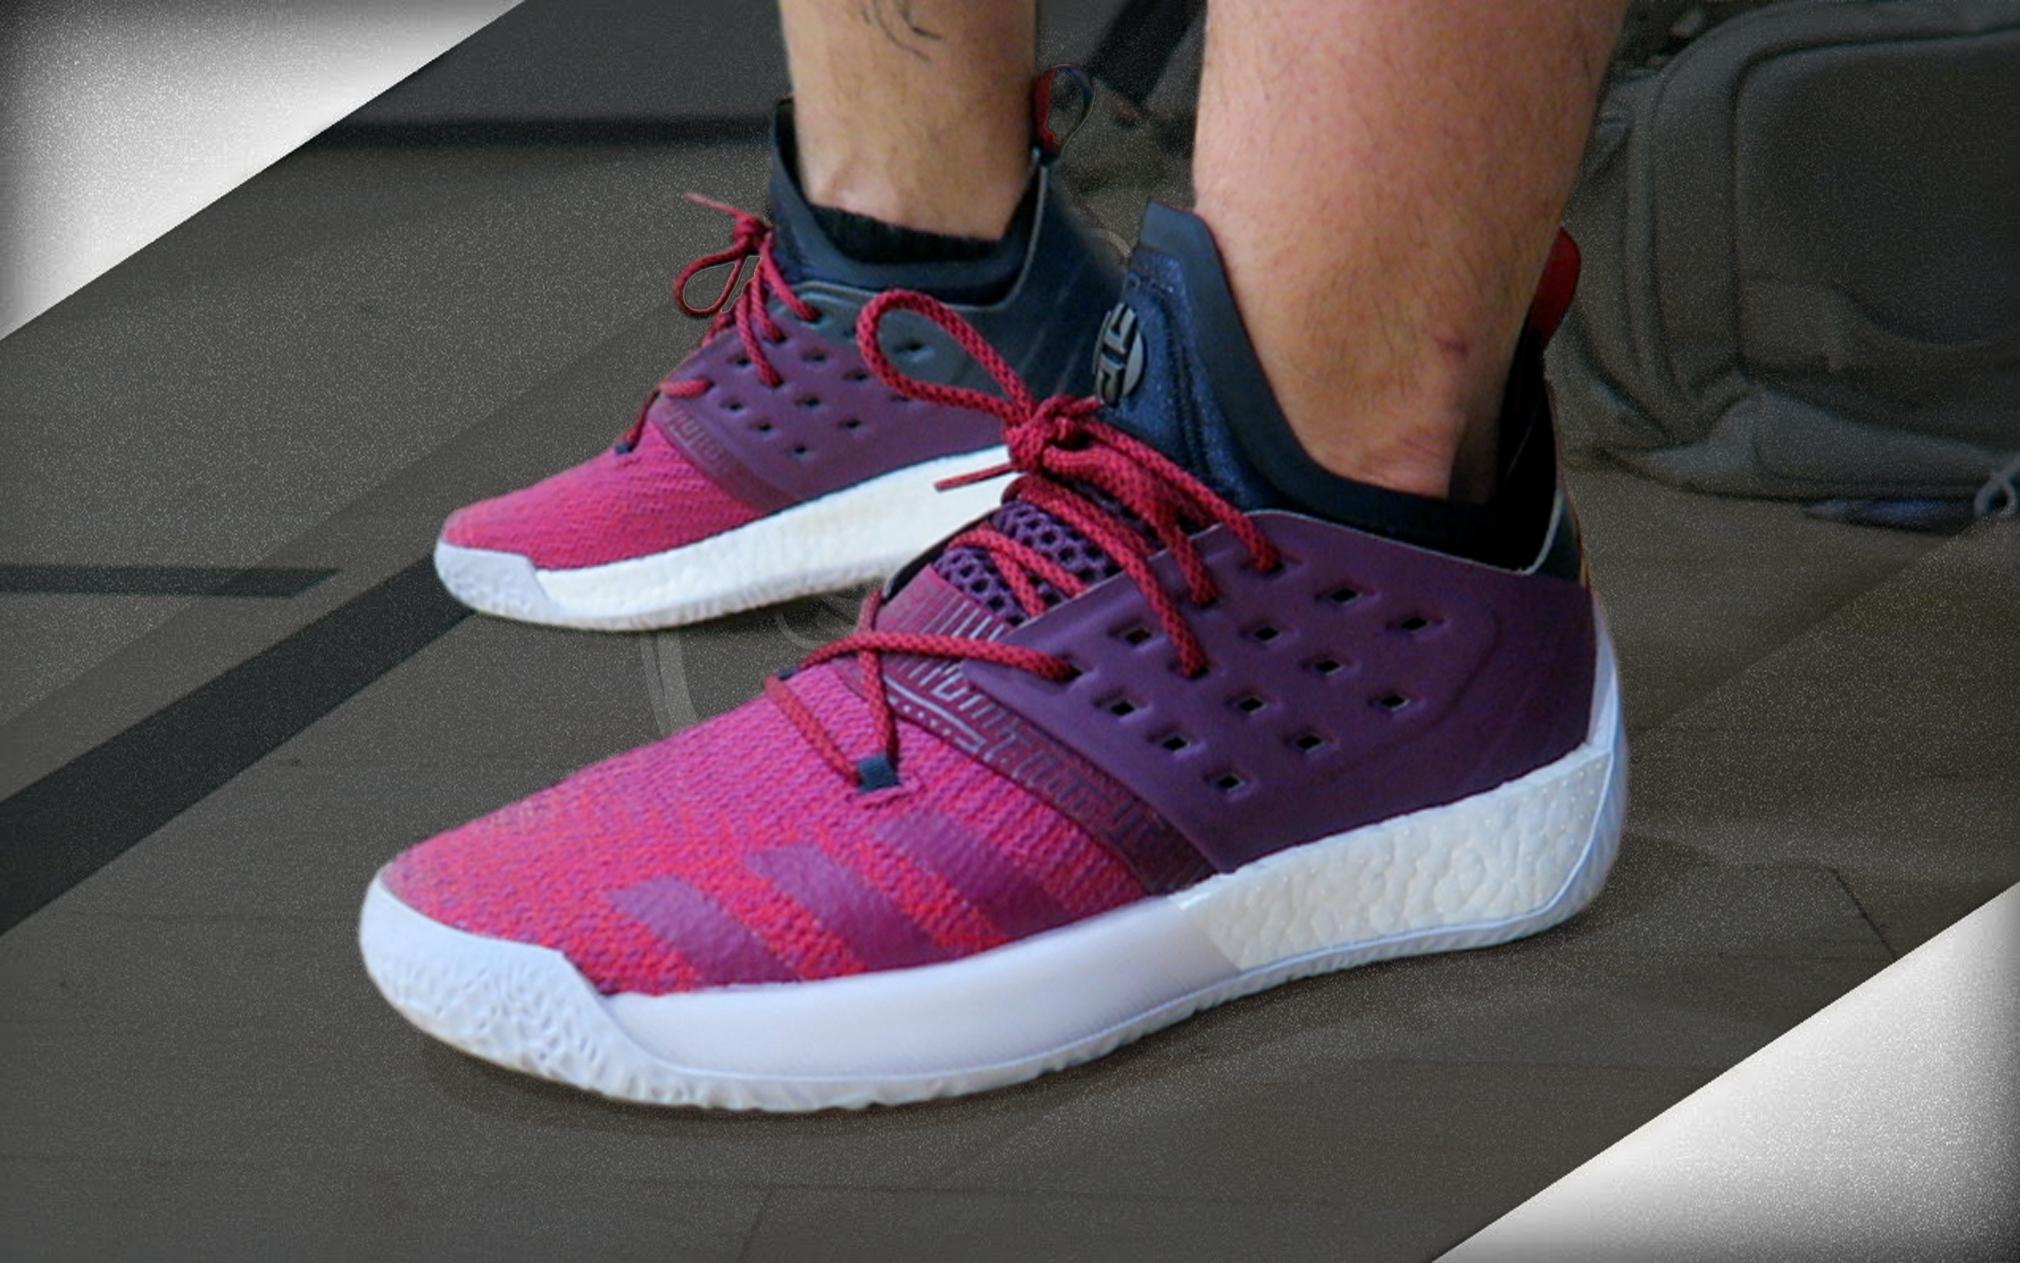 adidas-Harden-Vol-2-Detailed-Look